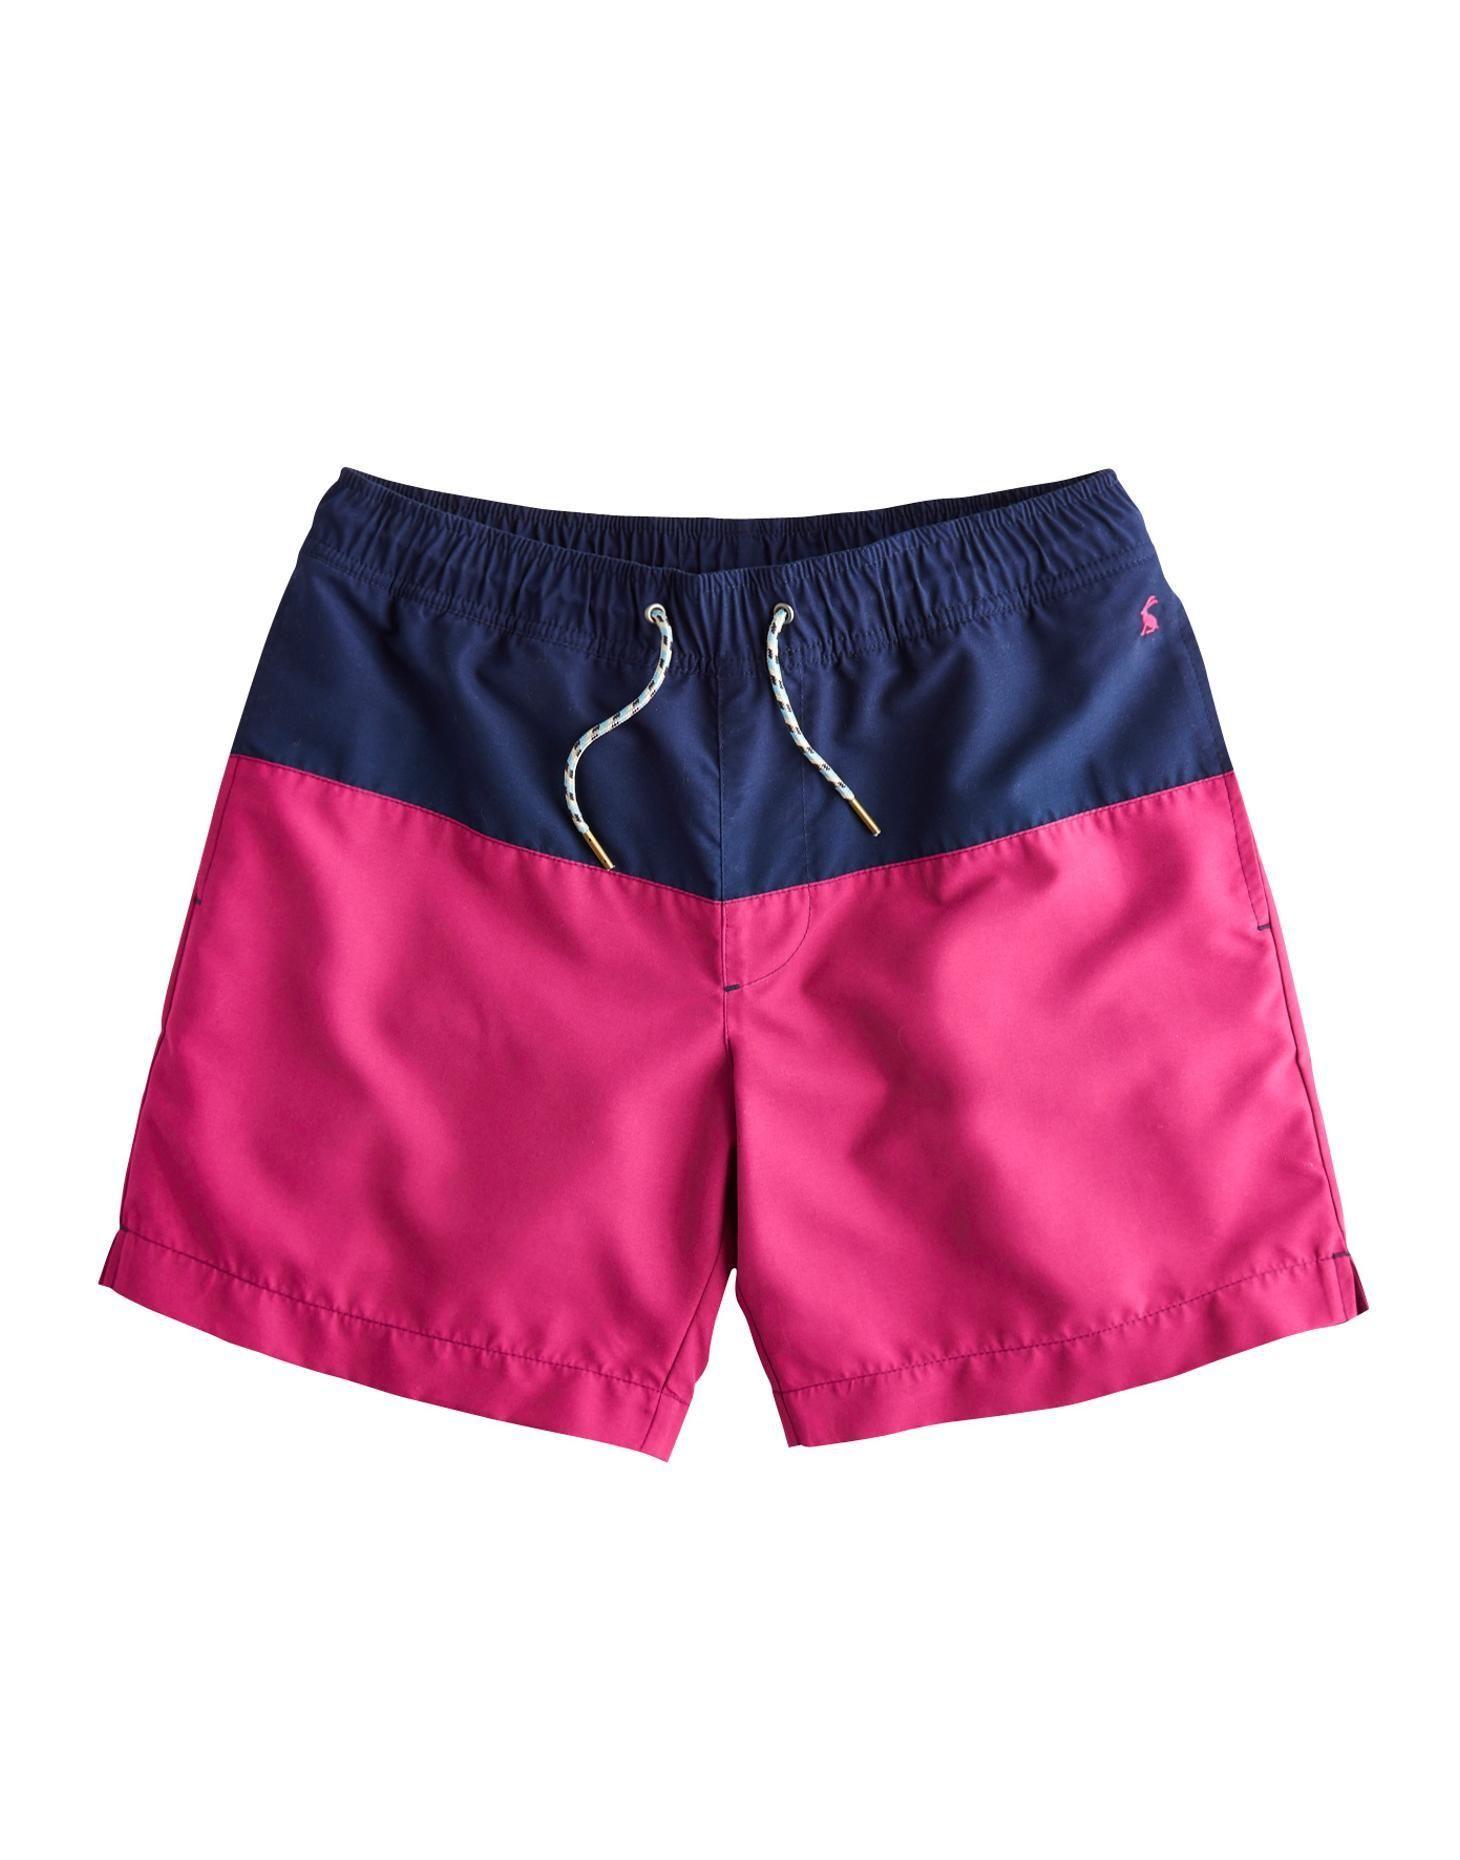 c790bbc545bf0 Mens Swim Shorts, Multi | Shorts | Mens swim shorts, Swim shorts e Men